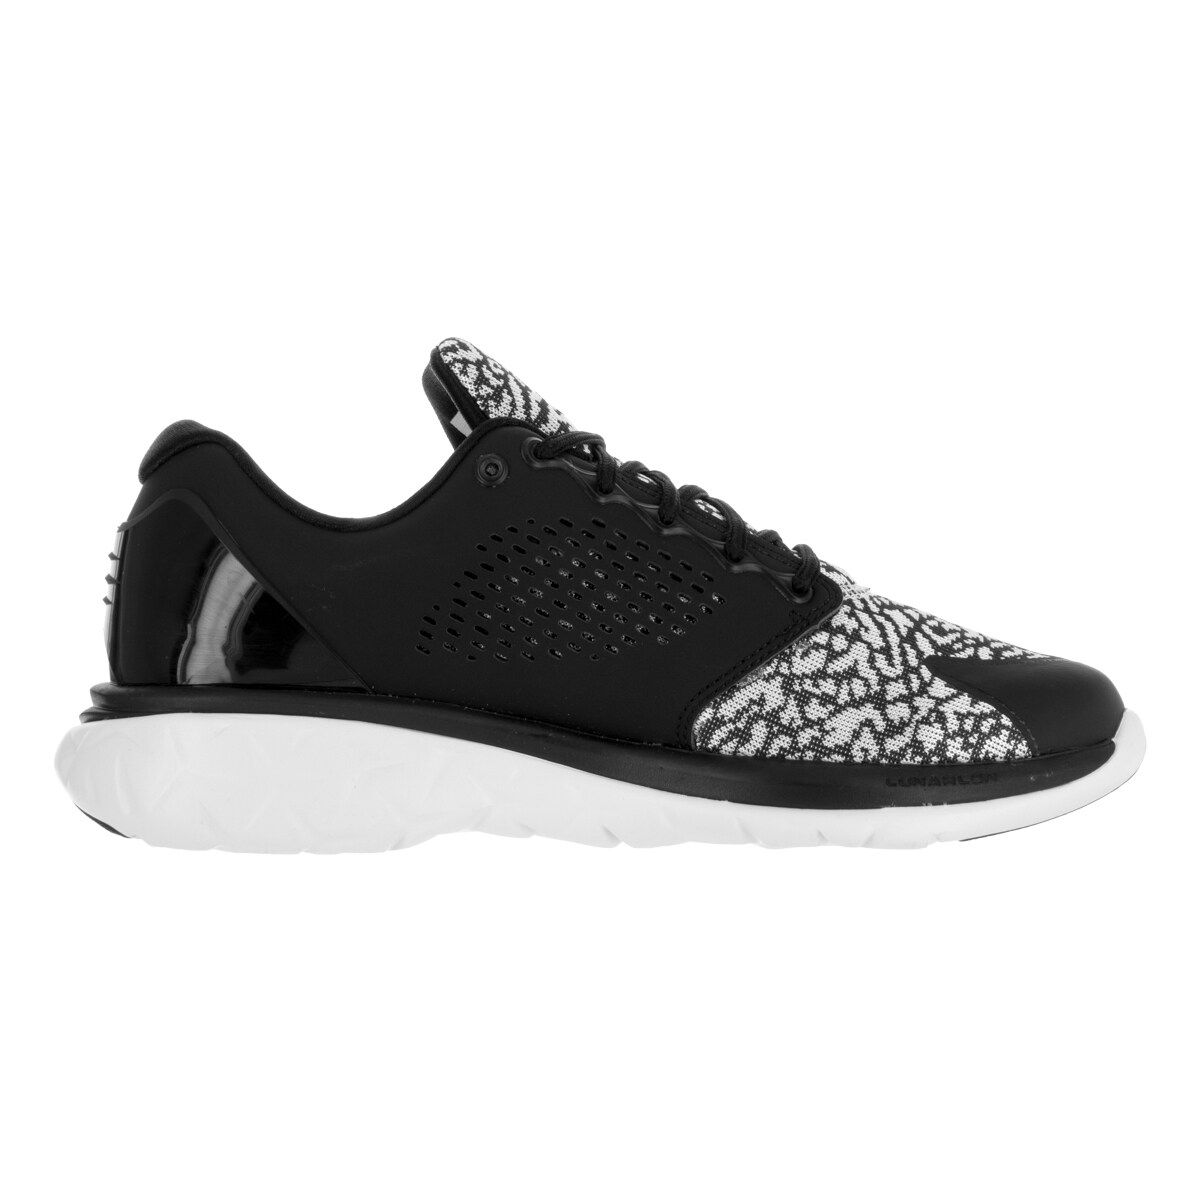 9299d3f7bb11 Shop Nike Jordan Men s Jordan Trainer St Black White Infrared 23 Training  Shoe - Free Shipping Today - Overstock - 13395365